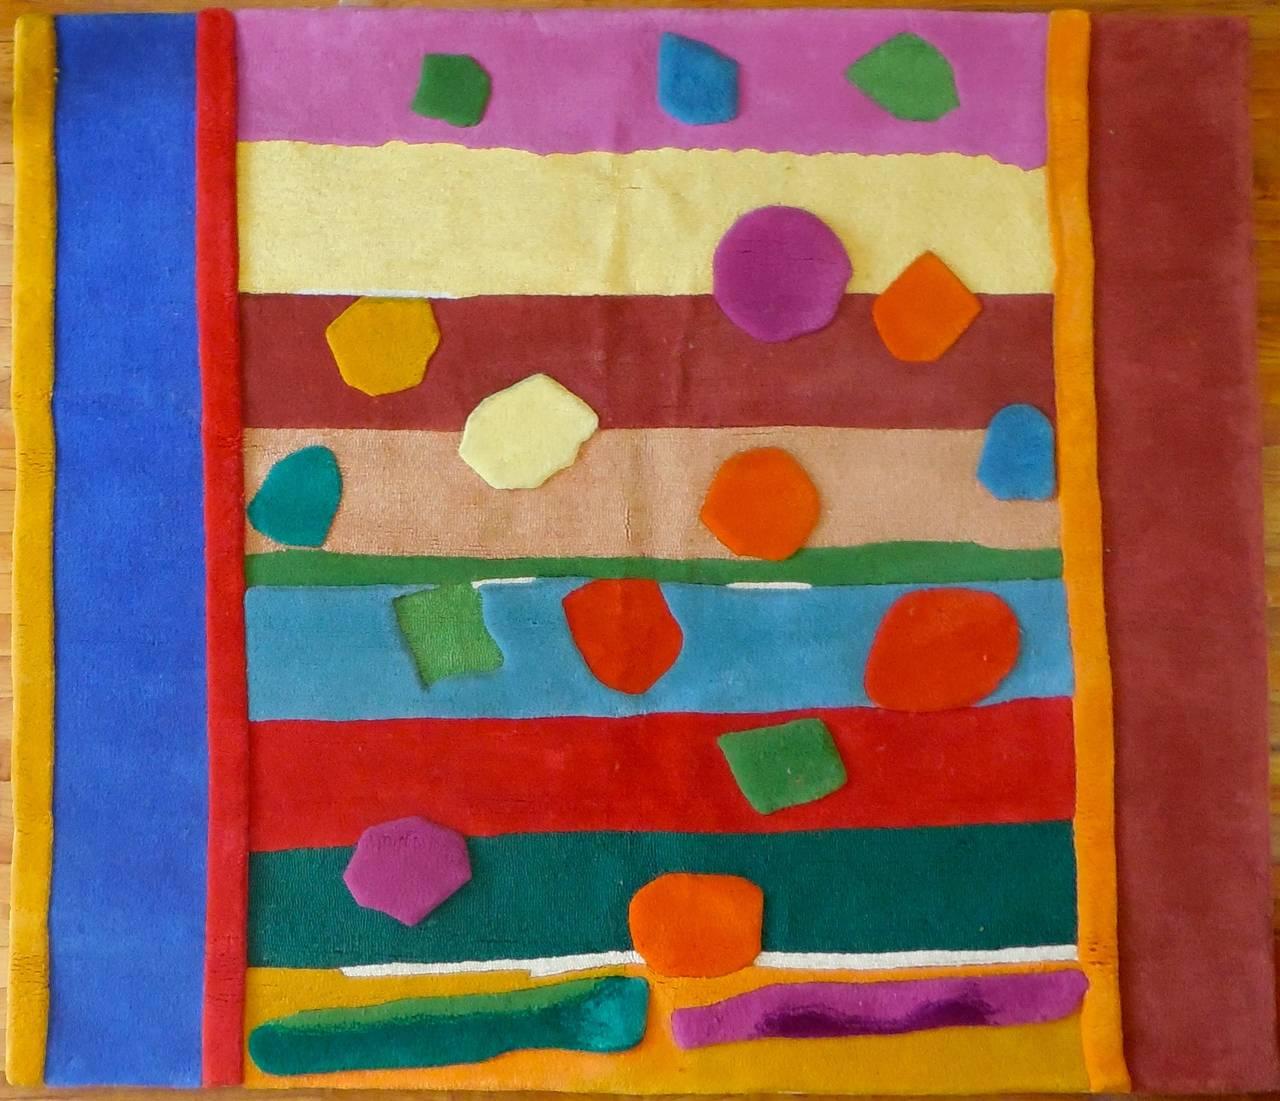 HOLIDAY Pile Tapestry Rug Esteben Vicente By Edward Fields - Art by Esteban Vicente